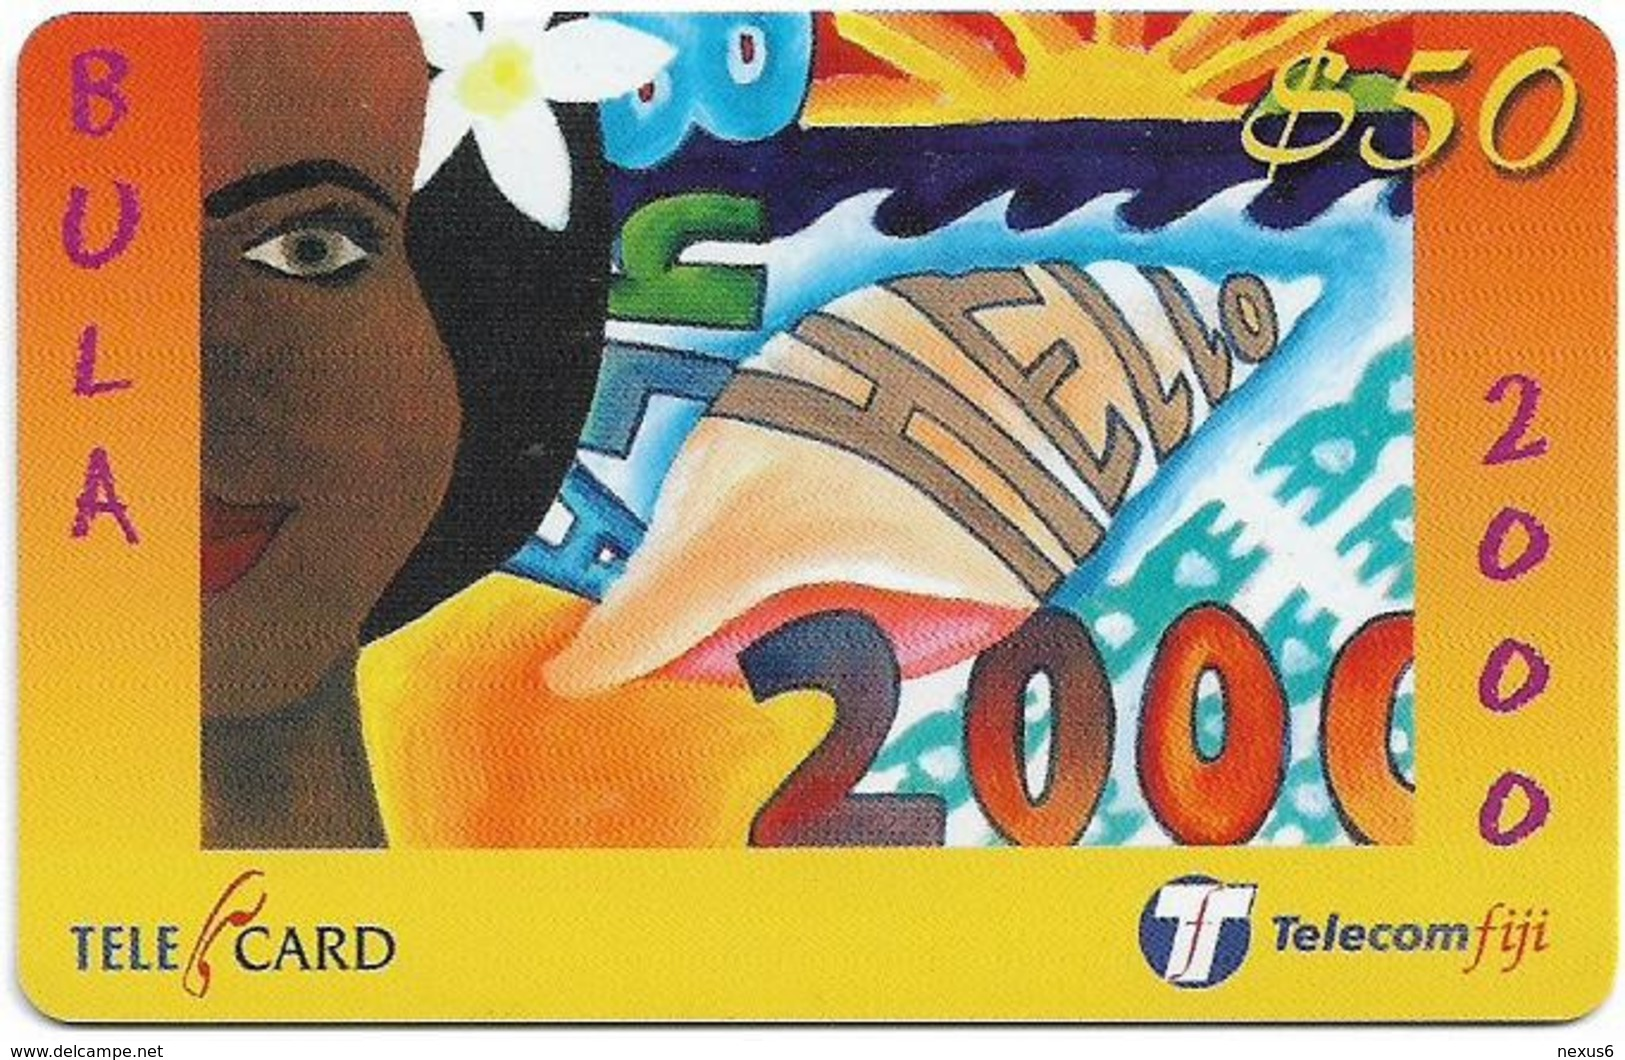 Fiji - Telecom Fiji - Bula 2000, Girl's Face, Cn.99041, Remote Mem. 50$, Used - Fiji